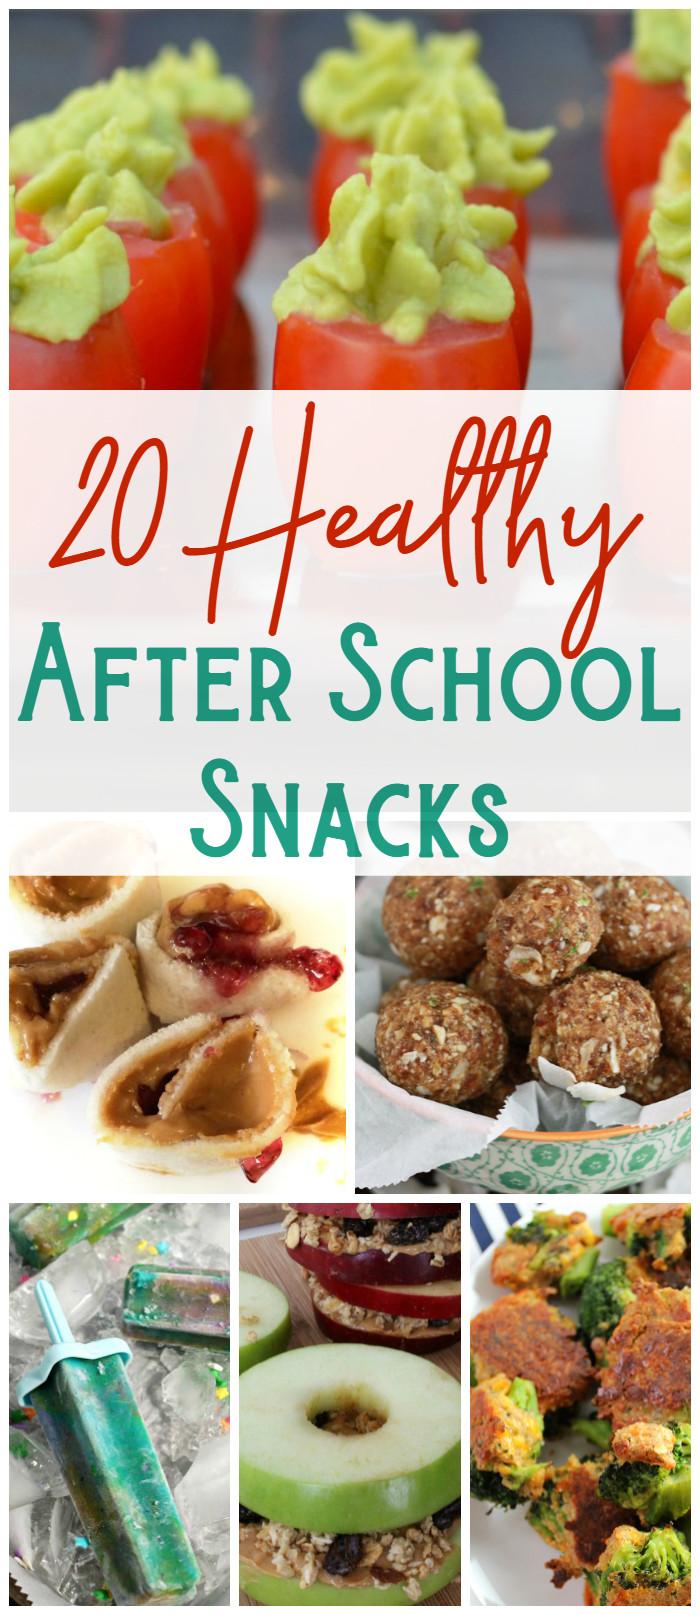 Healthy Afterschool Snacks  20 After School Snacks The Shirley Journey